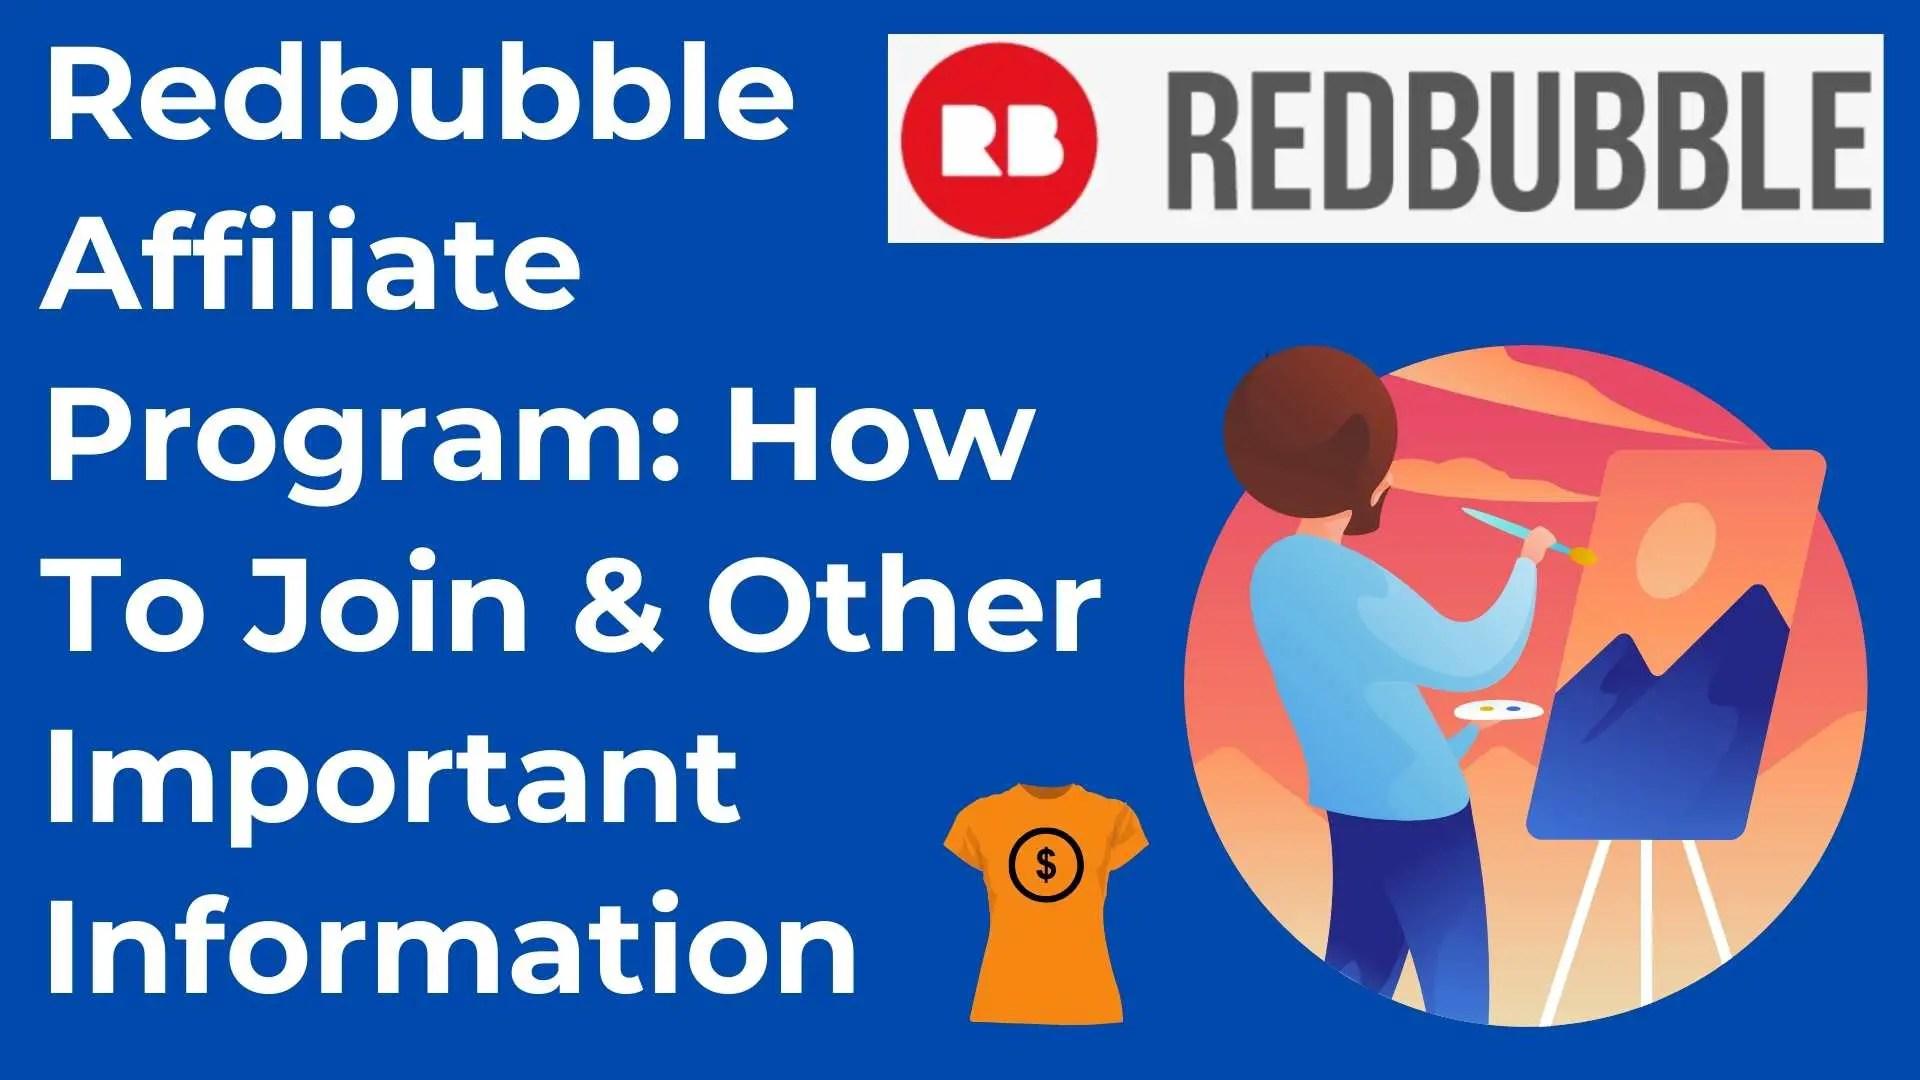 Redbubble affiliate program